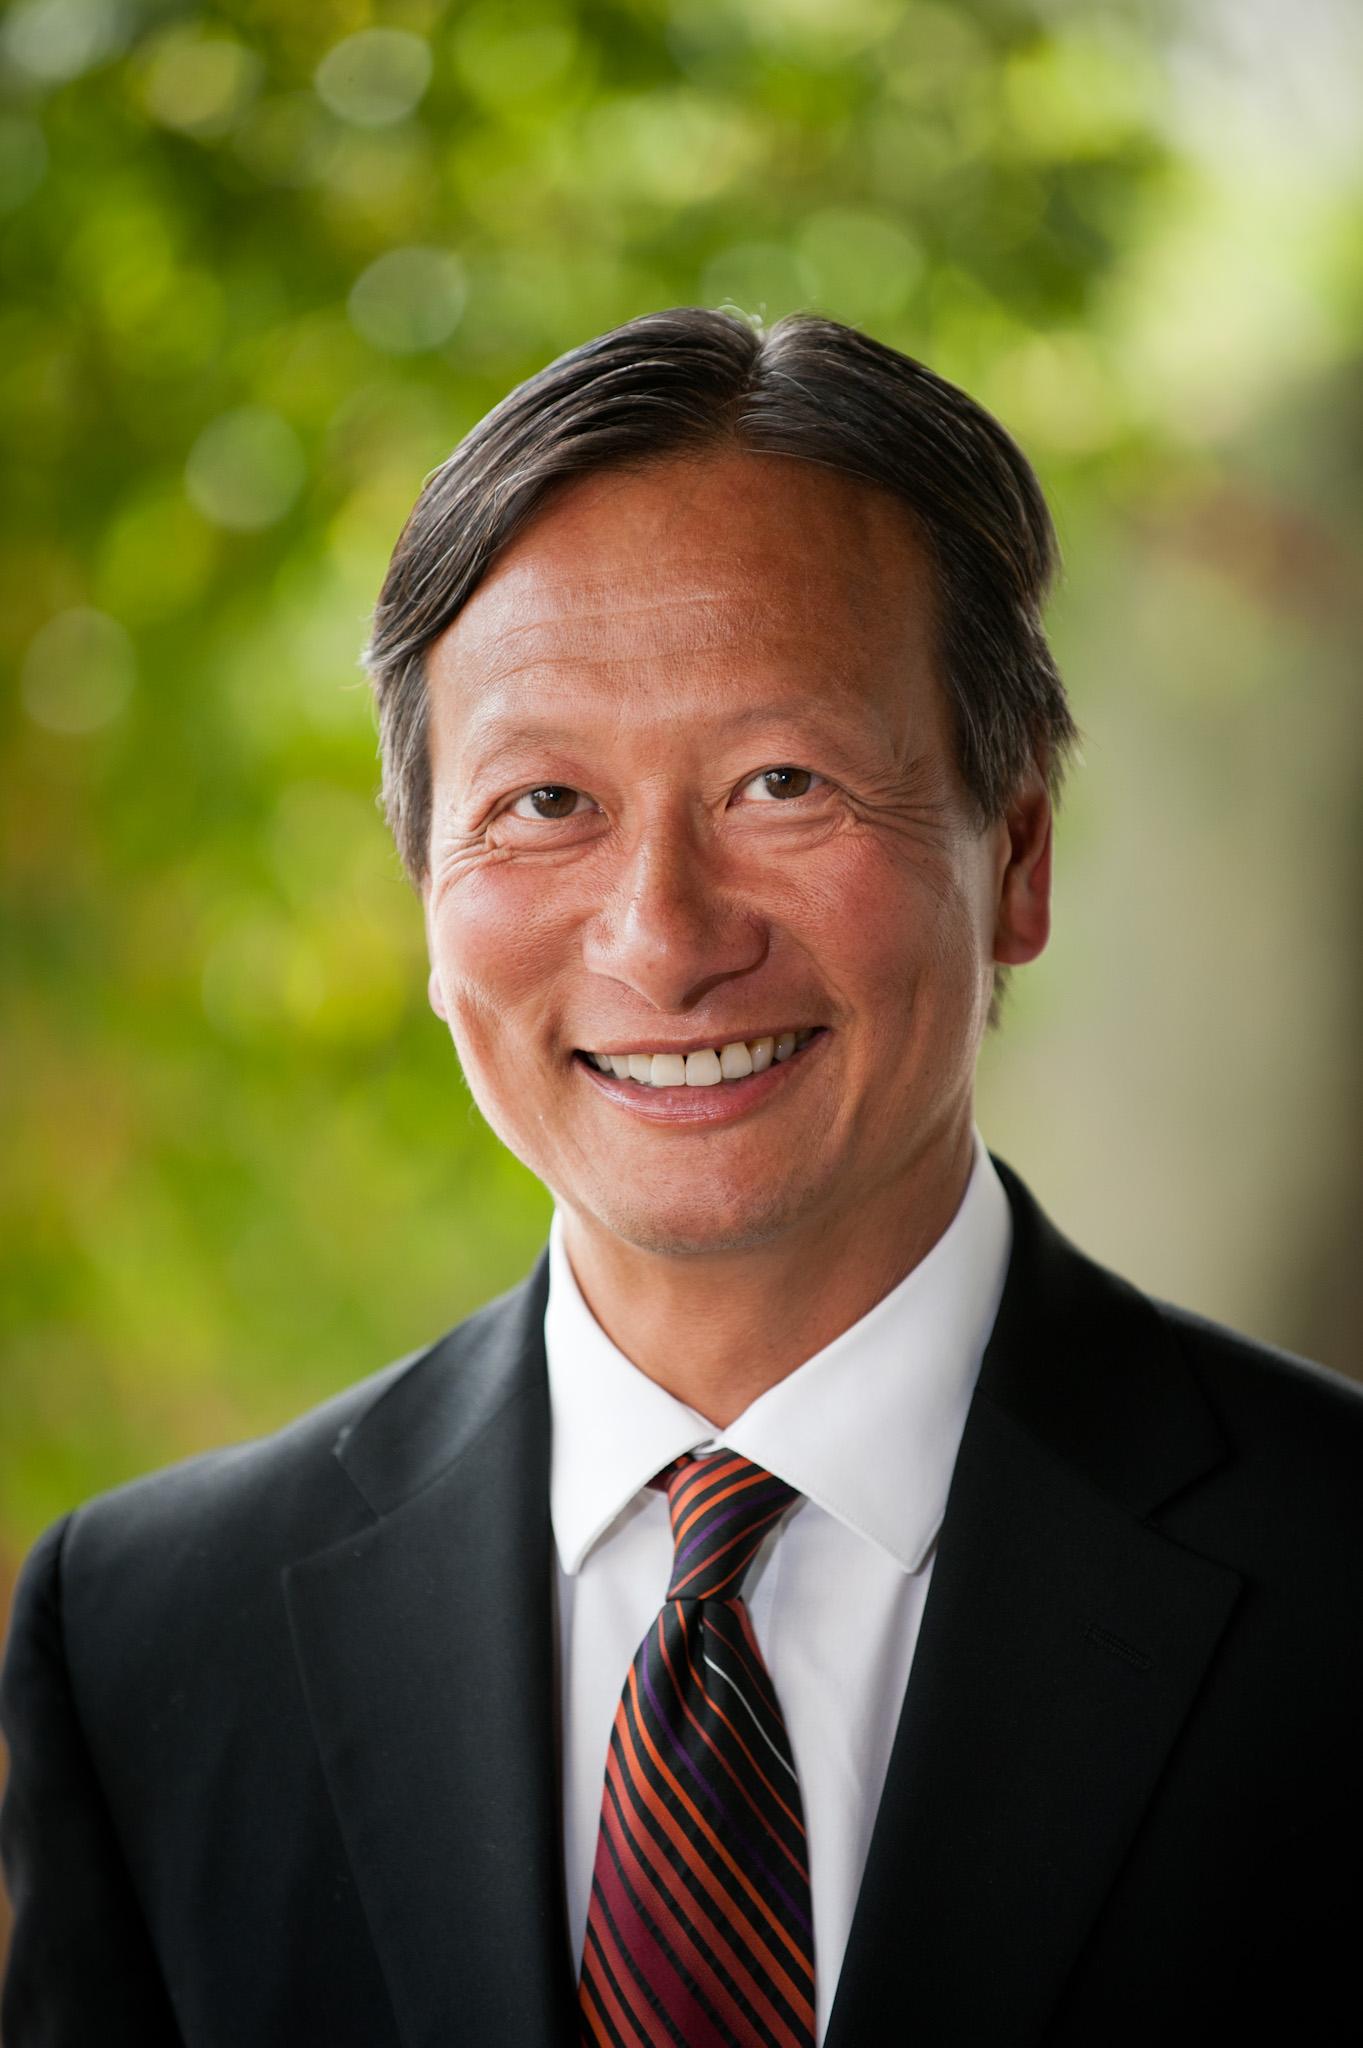 Tim Chan